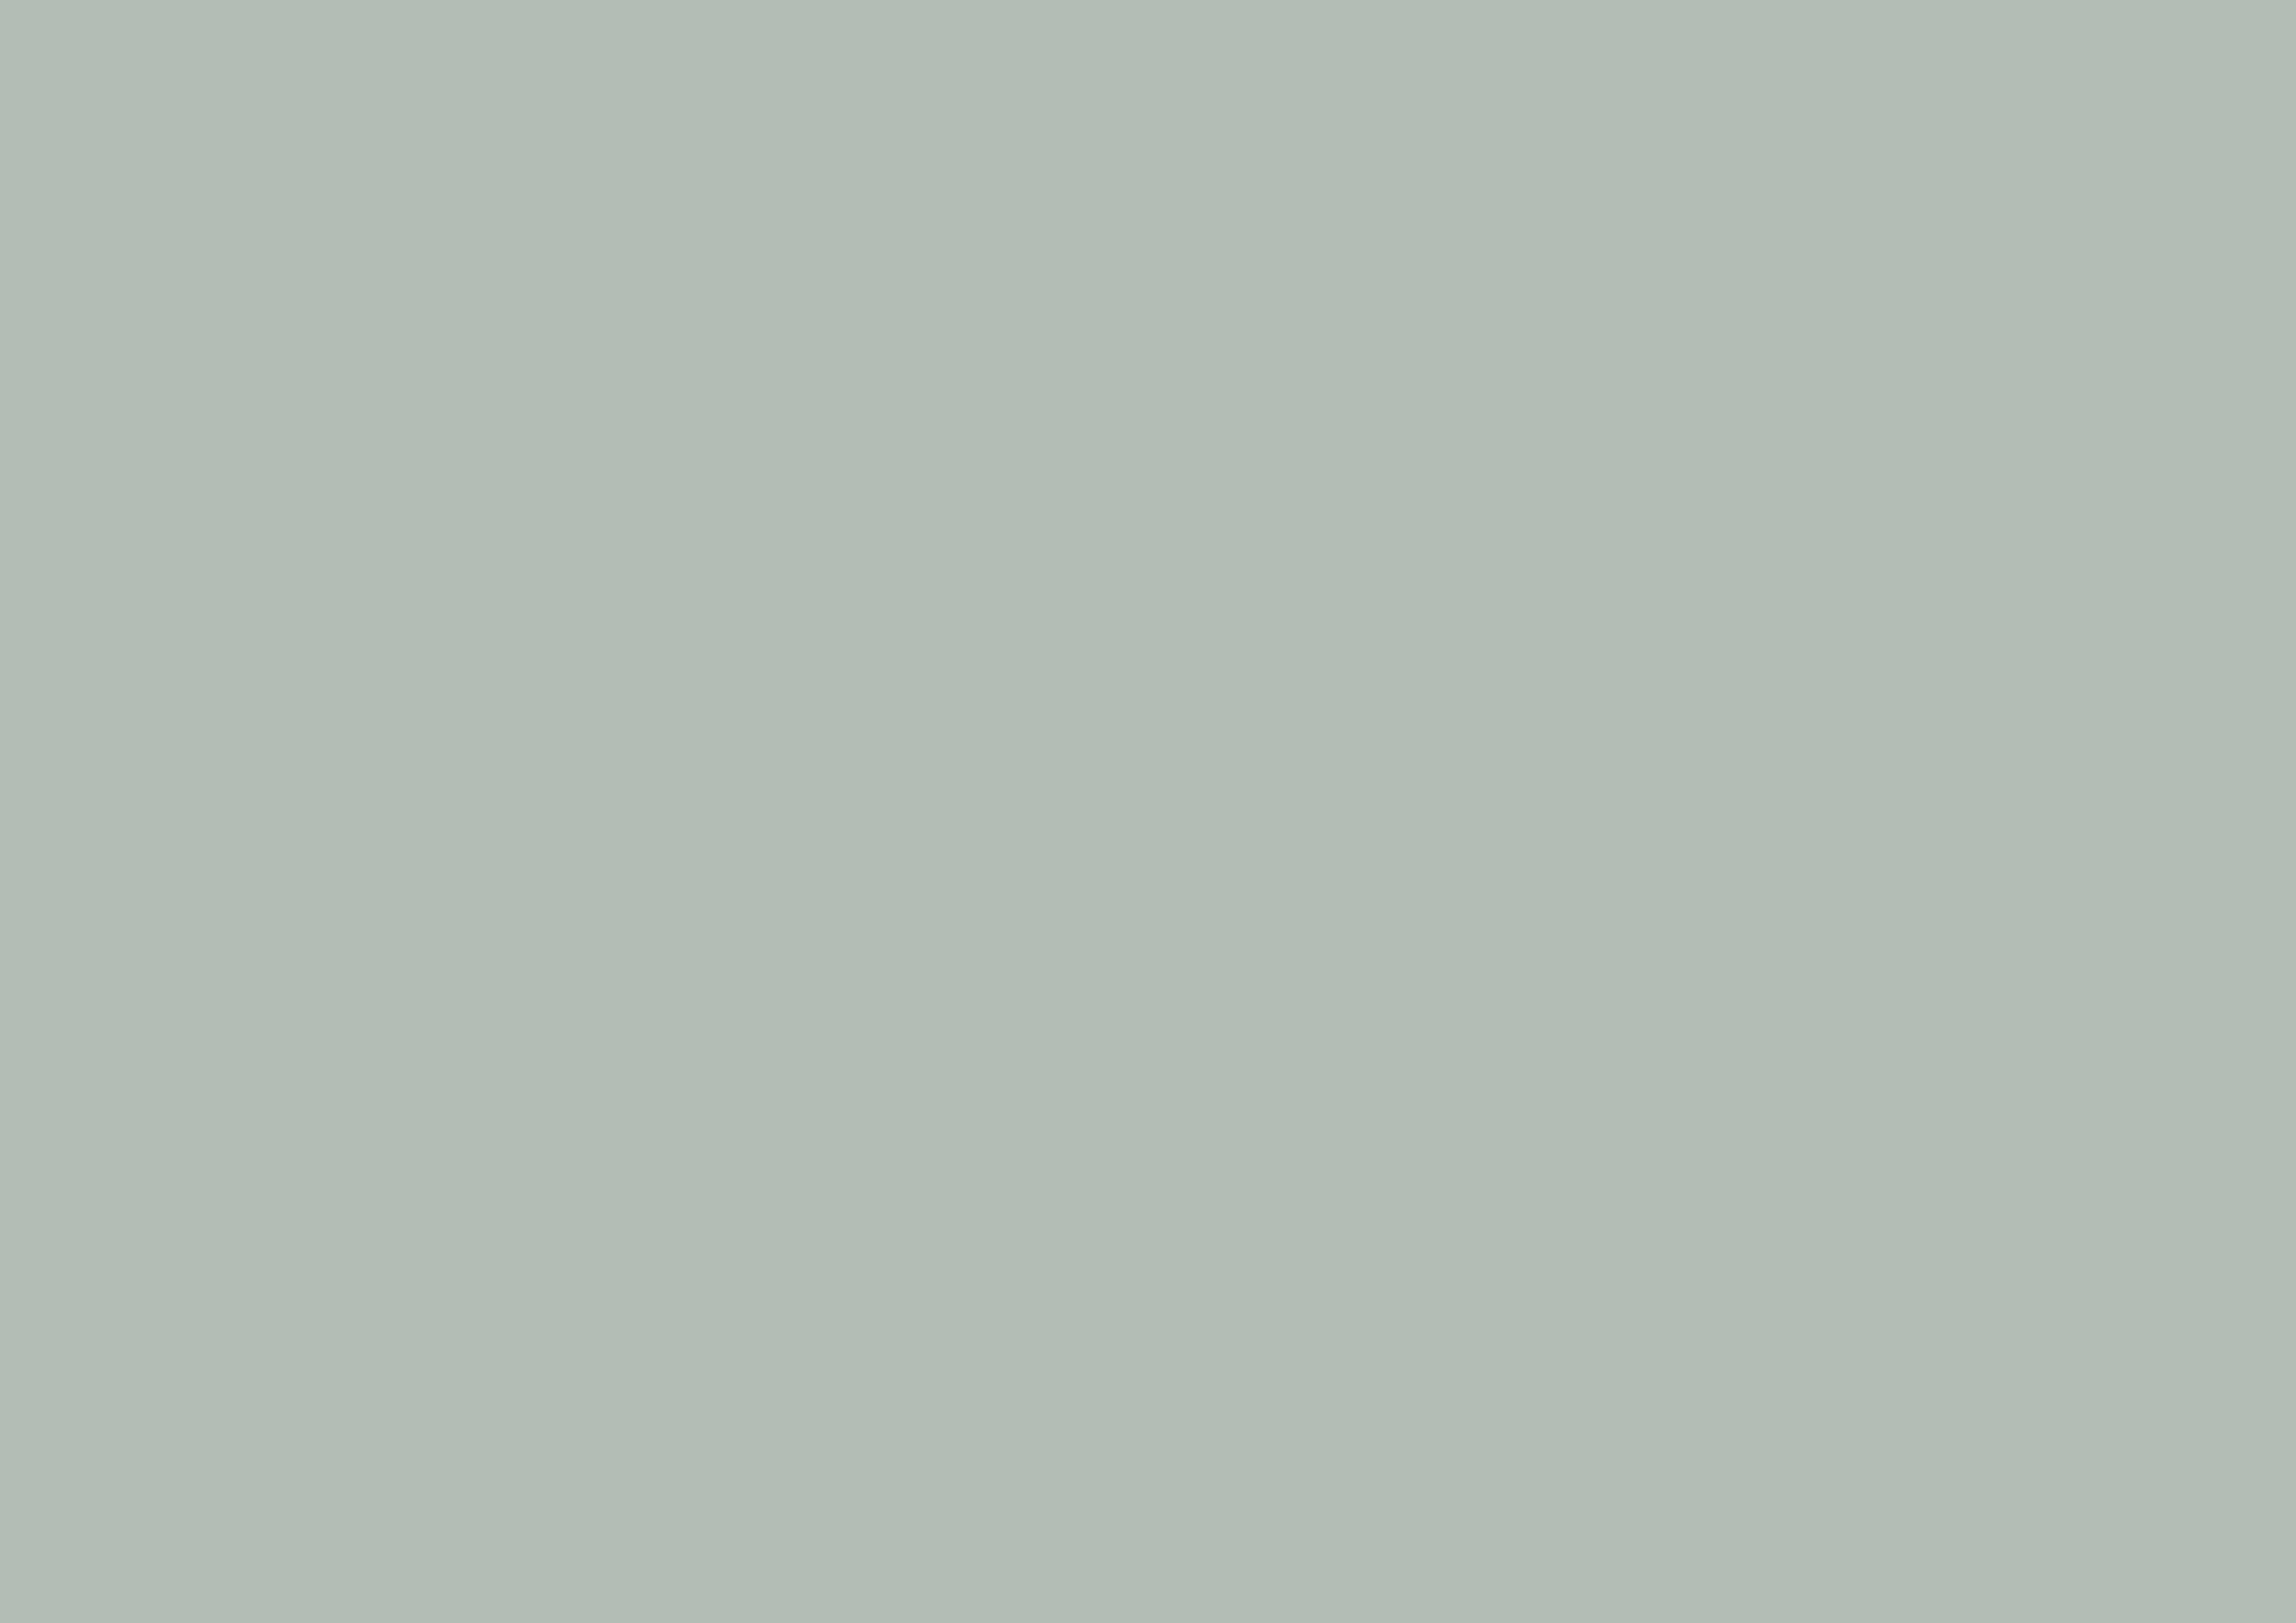 3508x2480 Ash Grey Solid Color Background